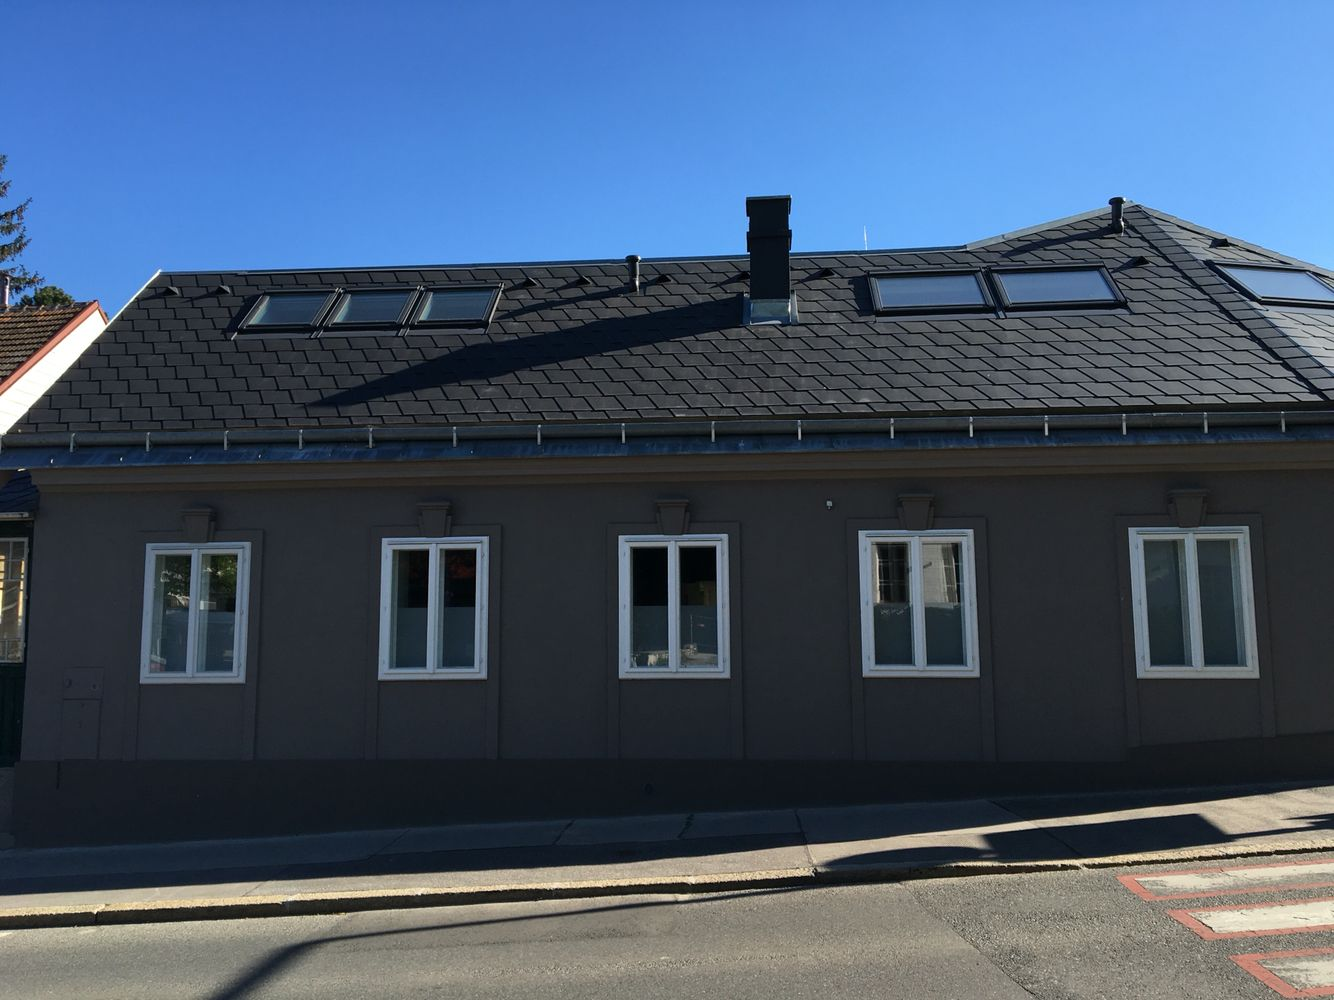 Fassadenfarbe grau braun  Fassaden Farbe Grau | fassade | Pinterest | Fassaden, Grau und Farben